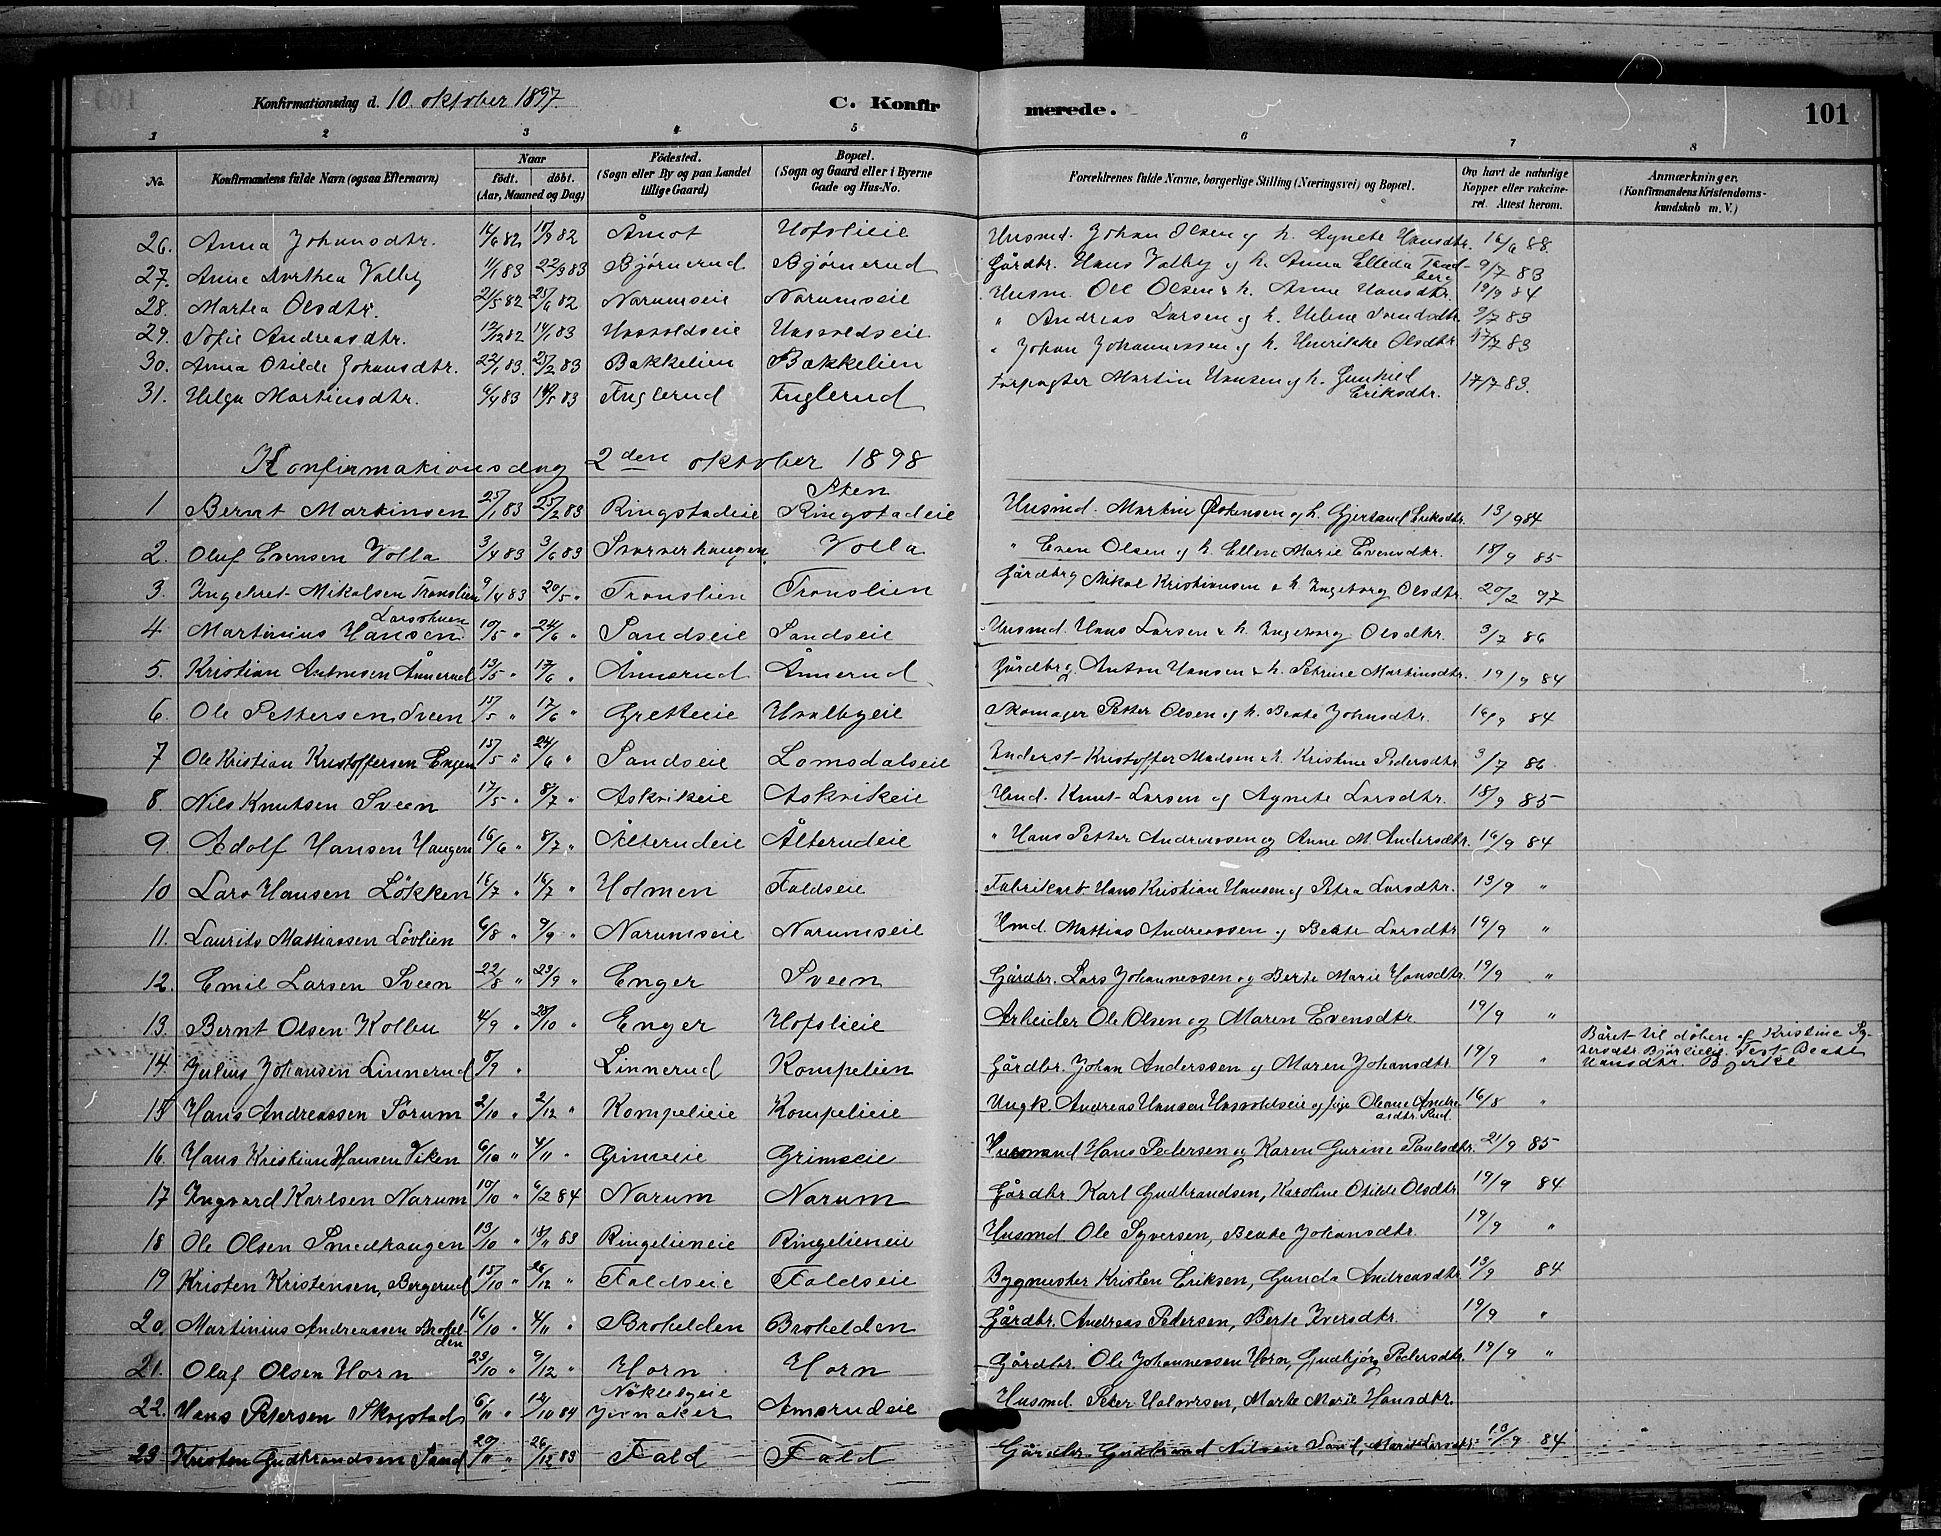 SAH, Søndre Land prestekontor, L/L0002: Klokkerbok nr. 2, 1884-1900, s. 101